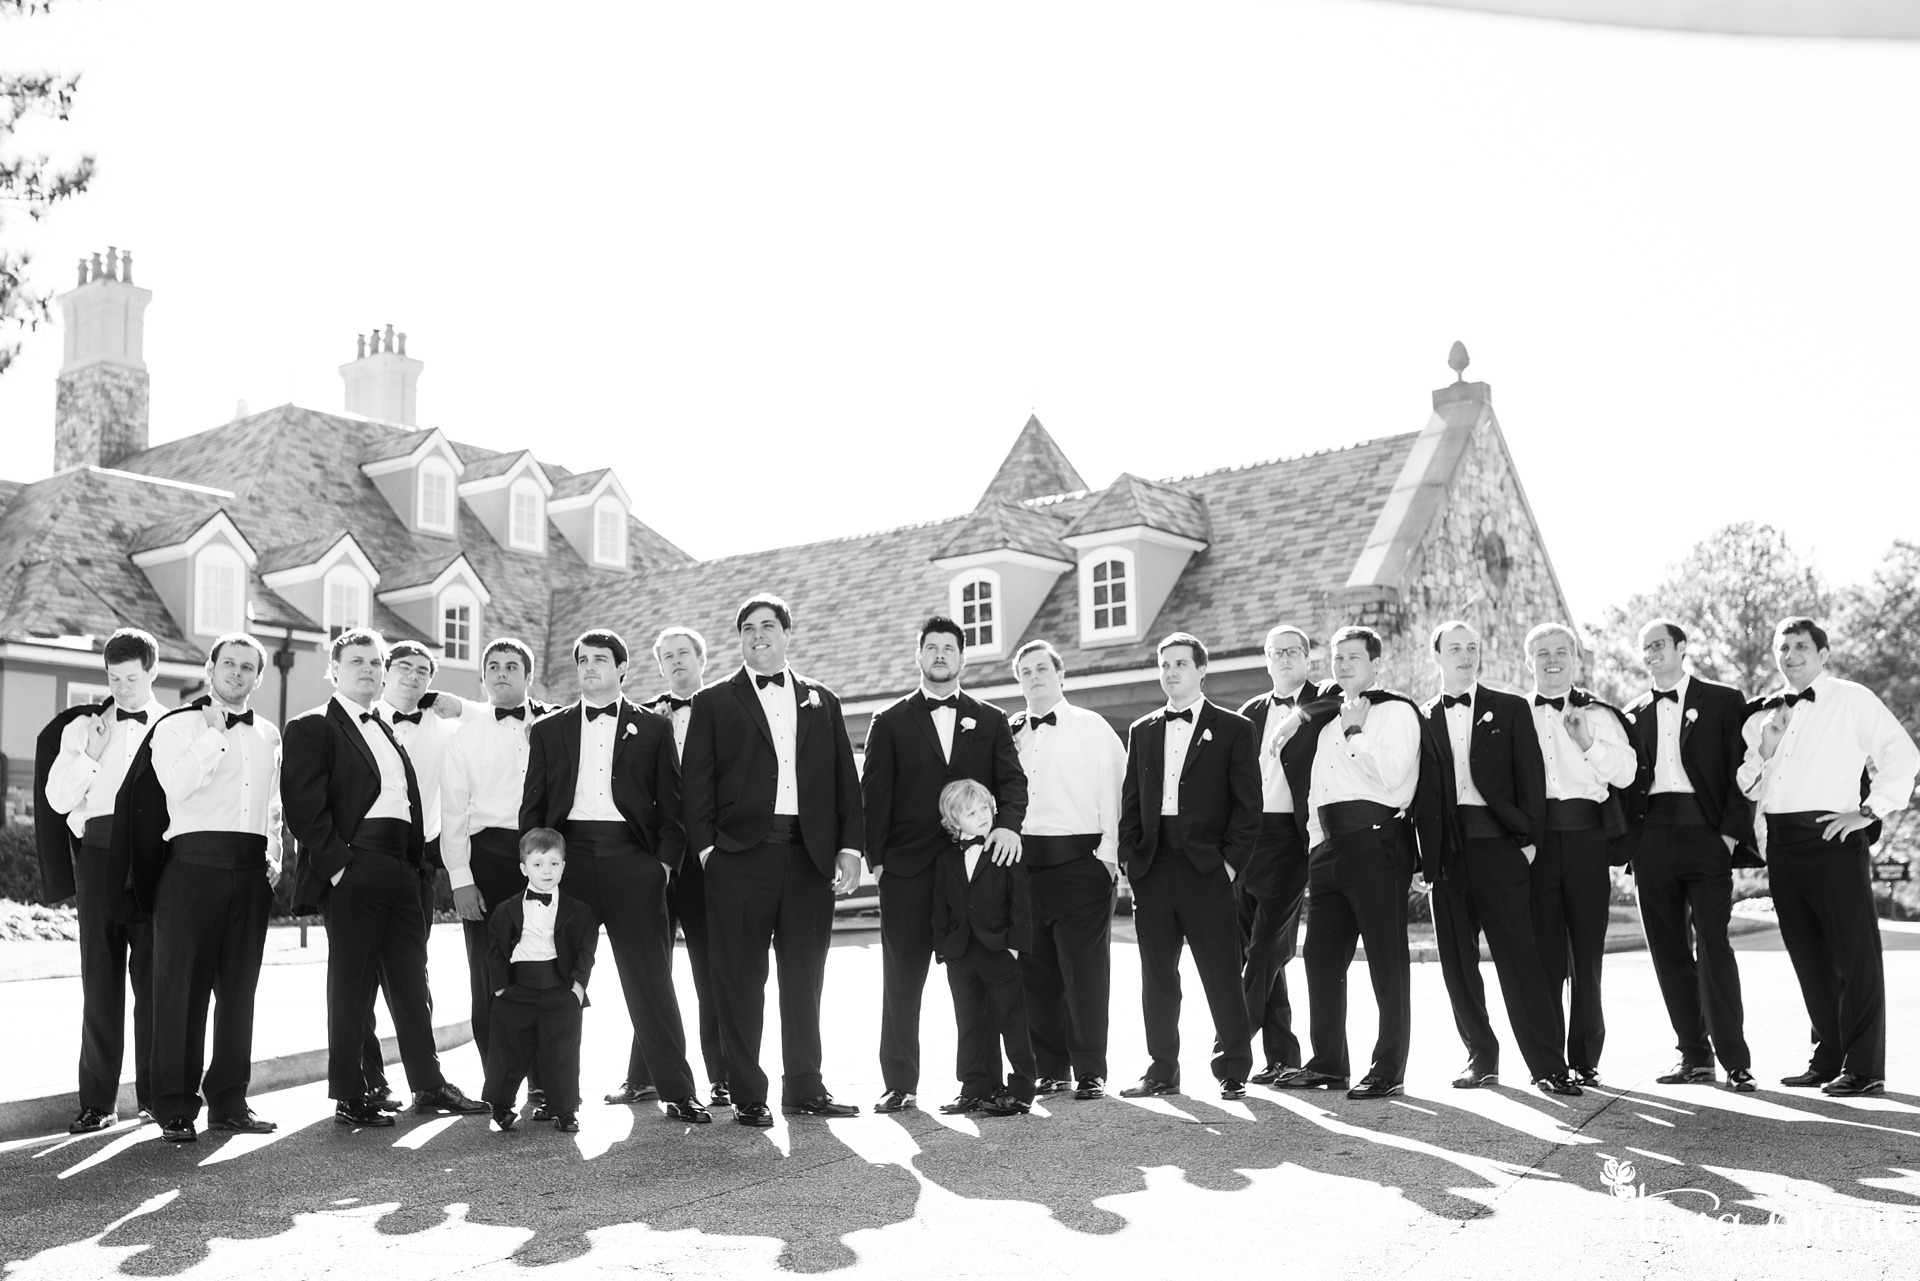 tessa_marie_legacy_moments_storytelling_candid_emotionally_driven_wedding_photographer_atlanta_wedding_photography_st_ives_country_club_wedding_boukates_bridals_by_lori_0029